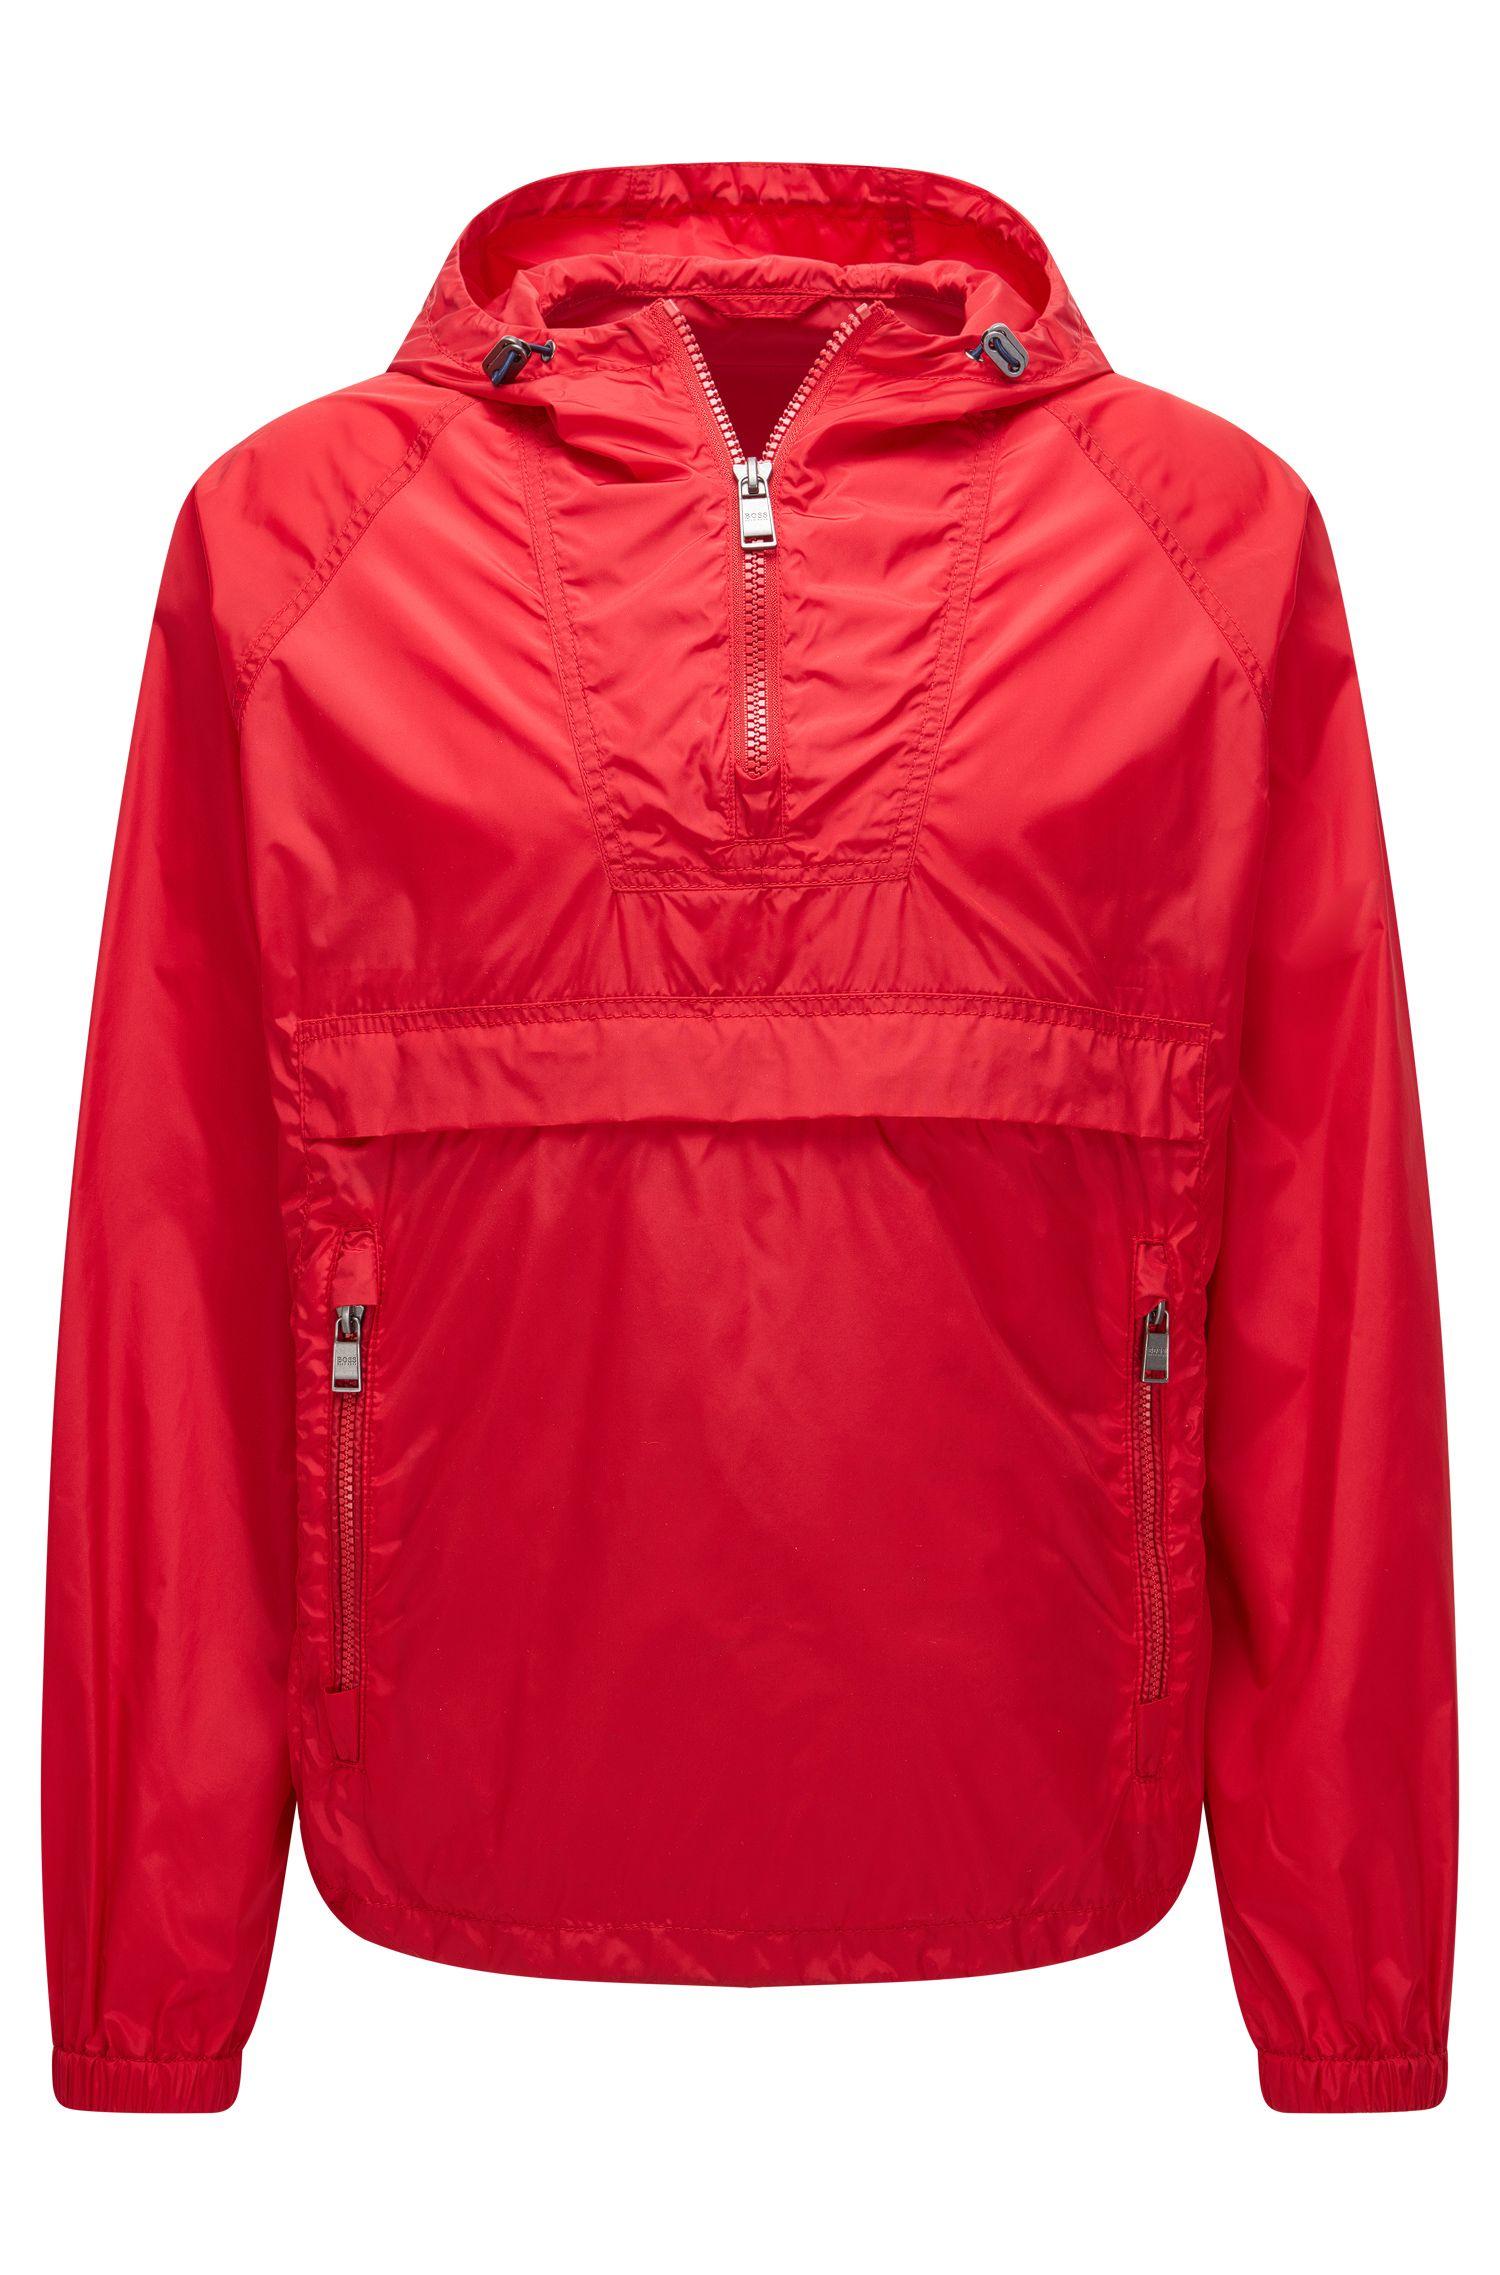 'Carbourn' | Nylon Rain Jacket